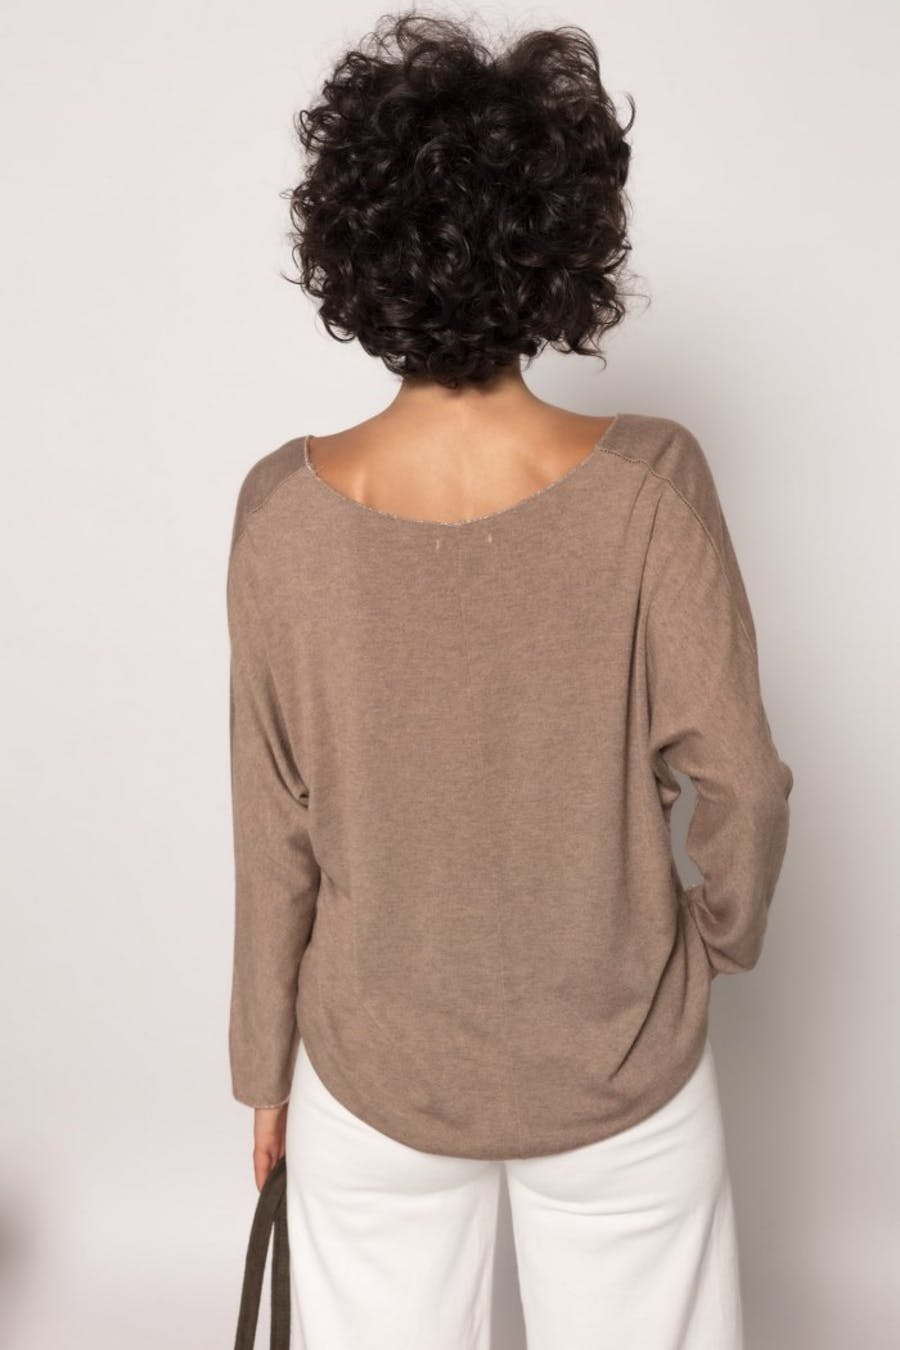 Camiseta massima grazia punto fino Marron